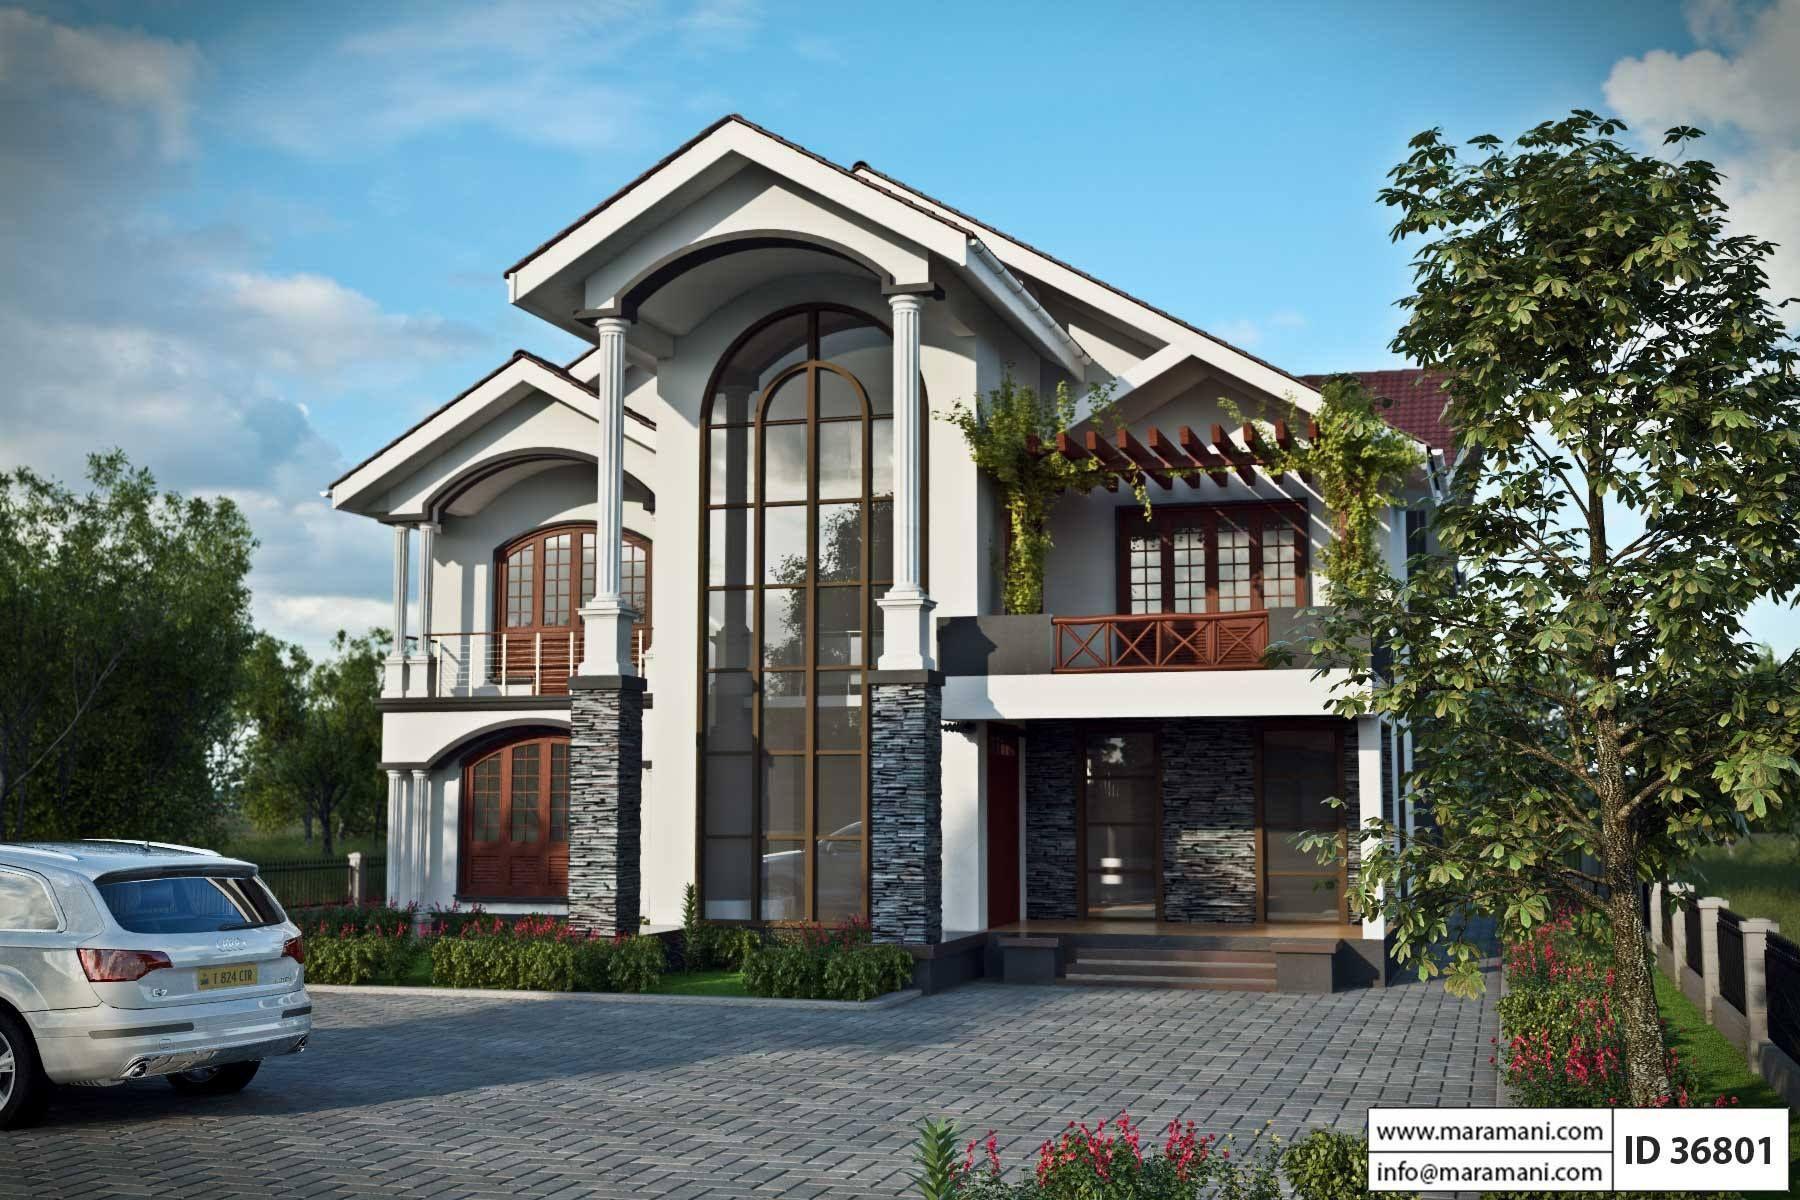 6 Bedroom House Design Id 36801 Bedroom House Plans House Plans Contemporary House Plans